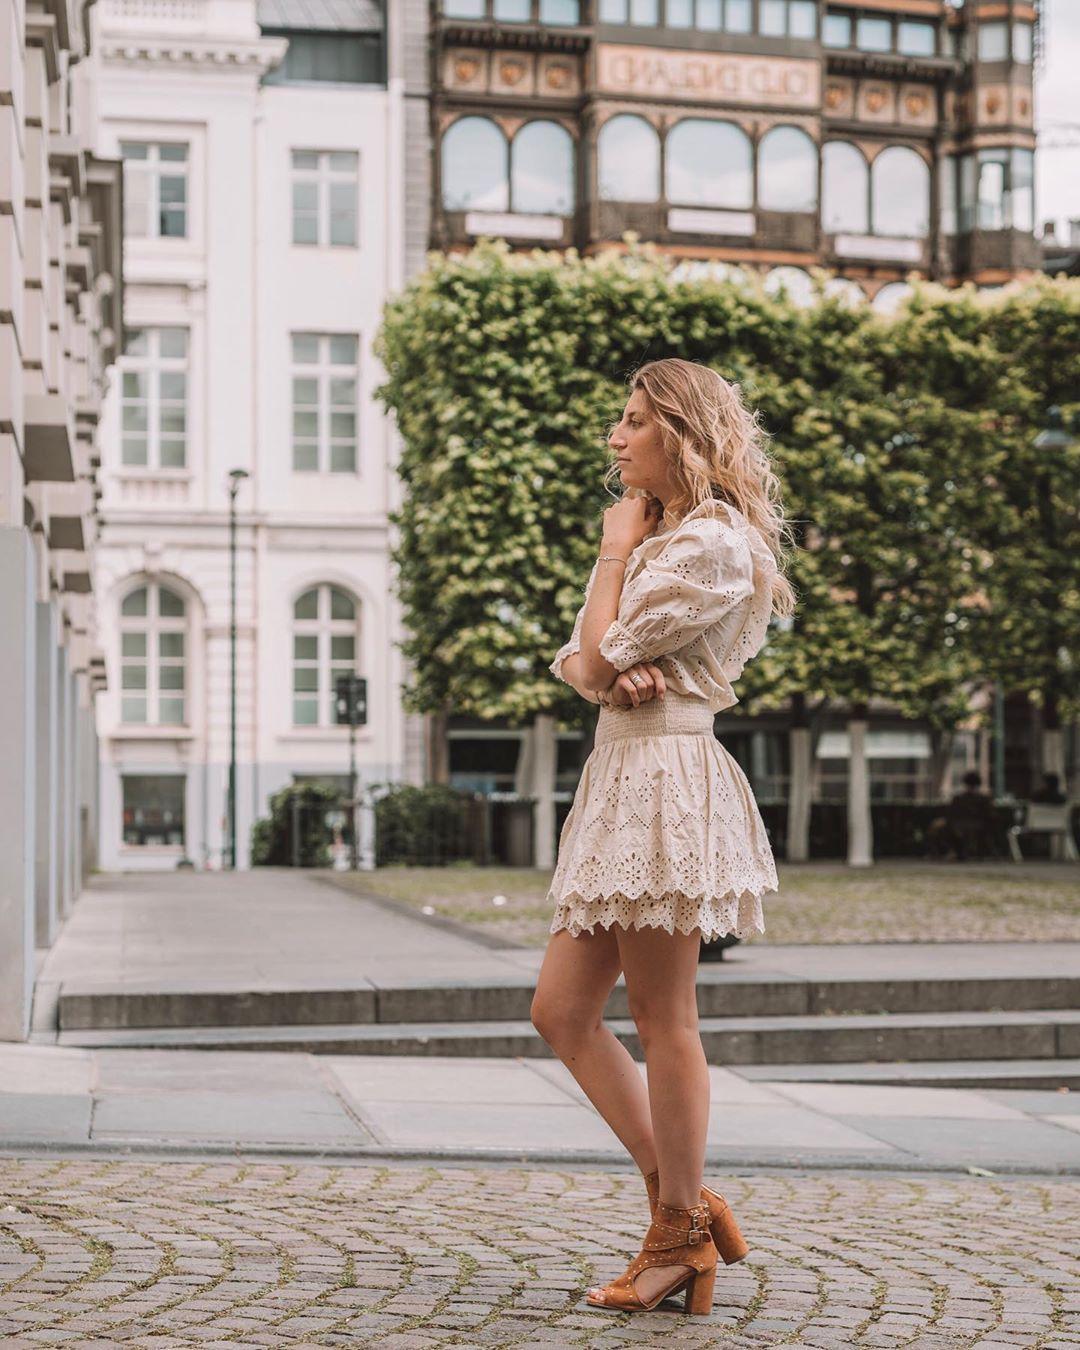 jupe à broderies perforées de Zara sur adelaiidee